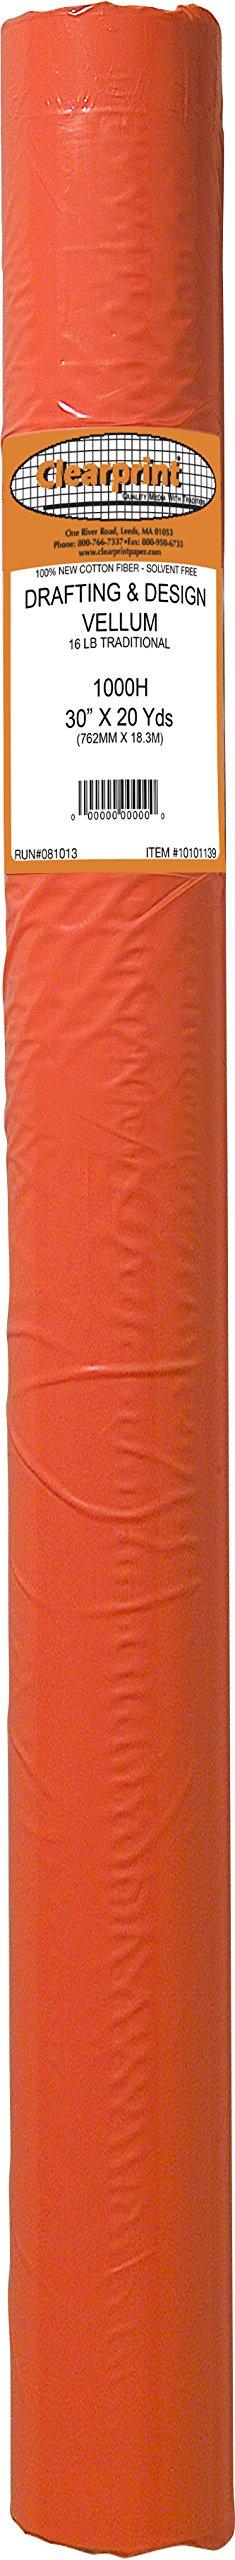 Clearprint 1000H Design Vellum Roll, 16 lb, 100% Cotton, 30 Inches W x 20 Yards Long, 1 Each (10101139)